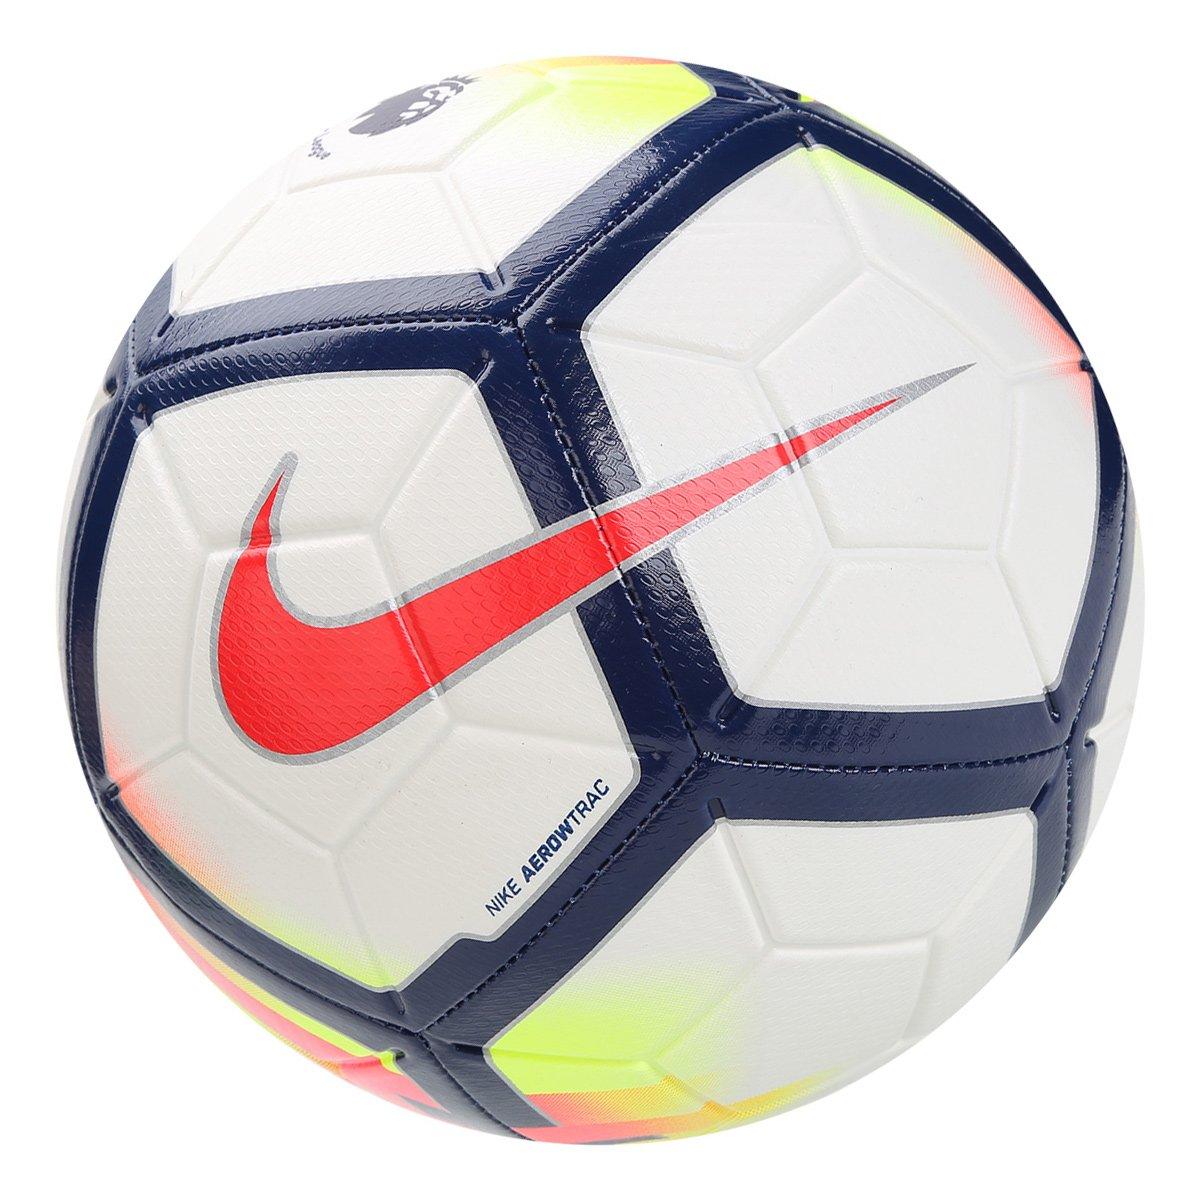 Bola Futebol Campo Nike Premier League Strikes - Compre Agora  934534c05f219